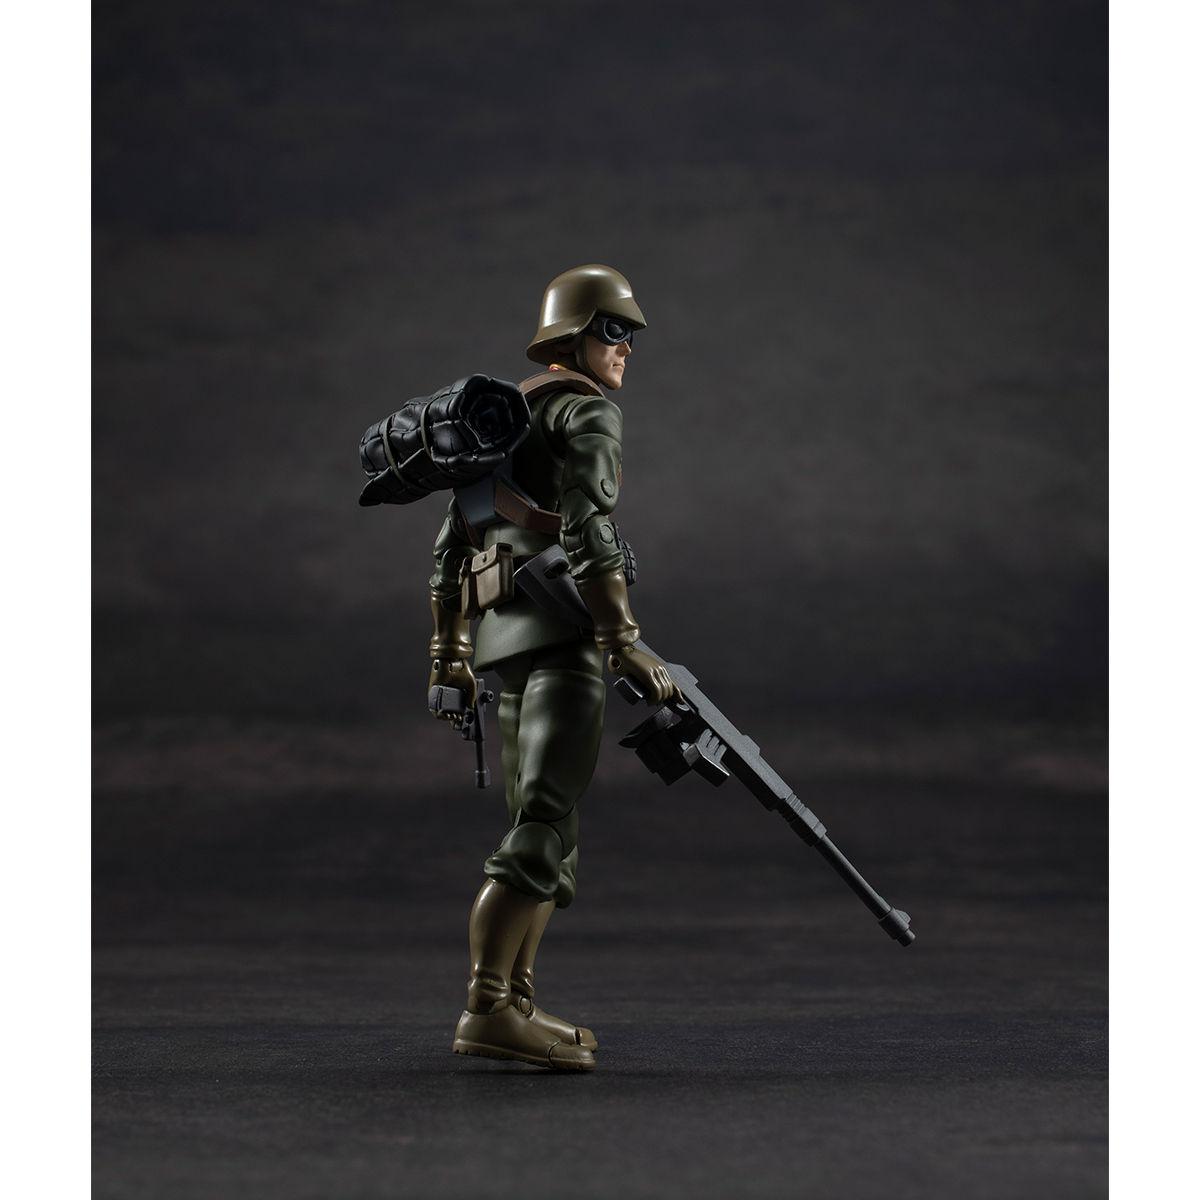 G.M.G. ガンダムミリタリージェネレーション『ジオン公国軍一般兵士01』1/18 可動フィギュア-004